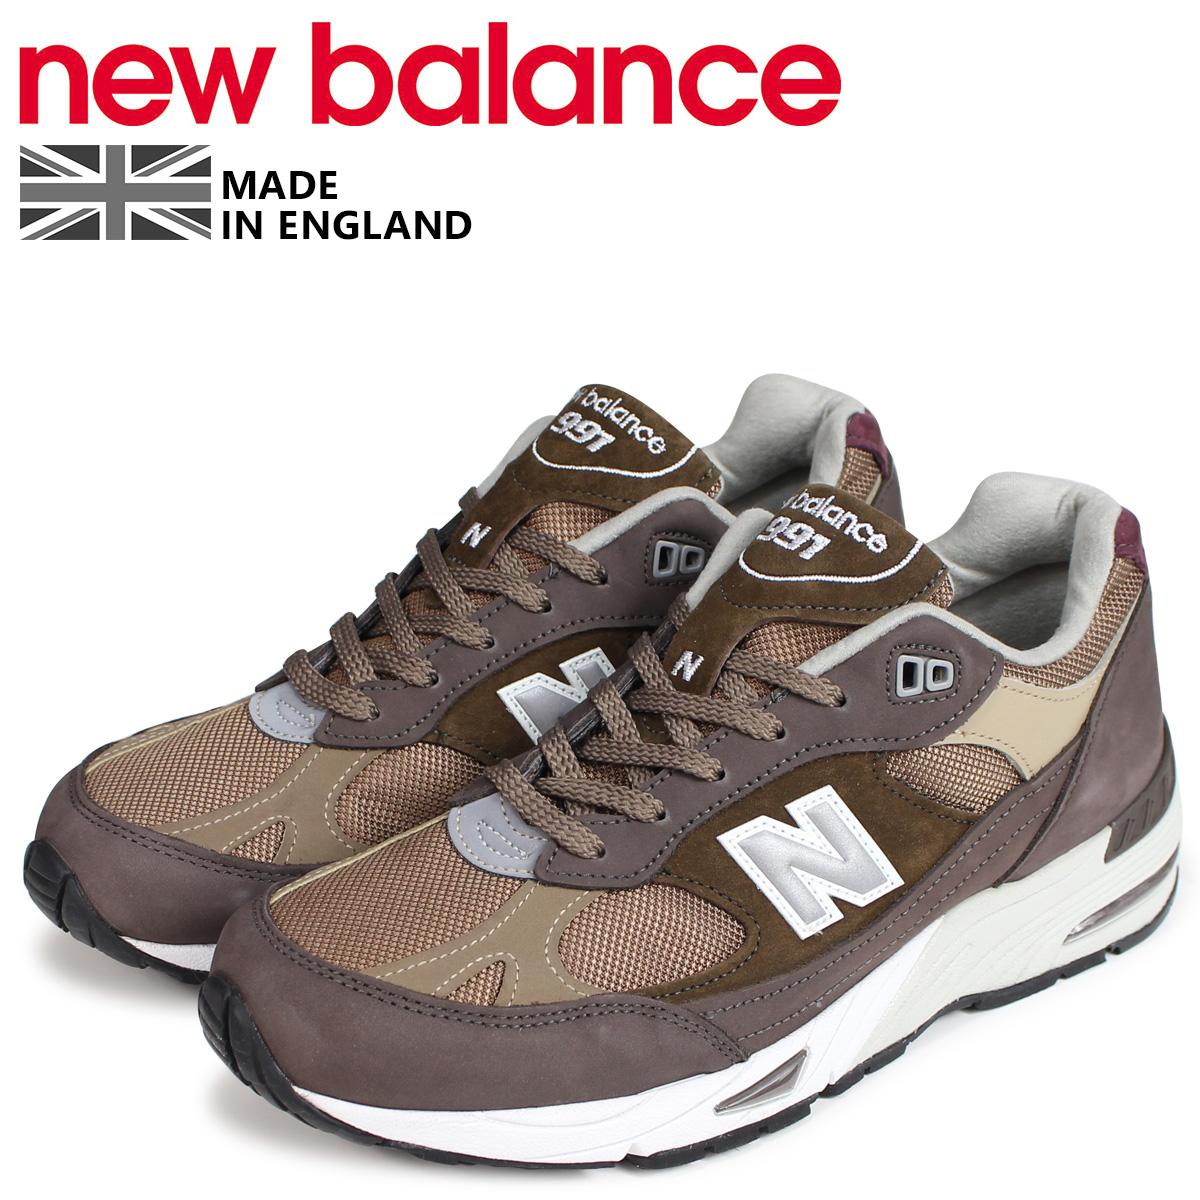 new balance 991 メンズ ニューバランス スニーカー M991NGG Dワイズ MADE IN UK ブラウン [9/15 新入荷]